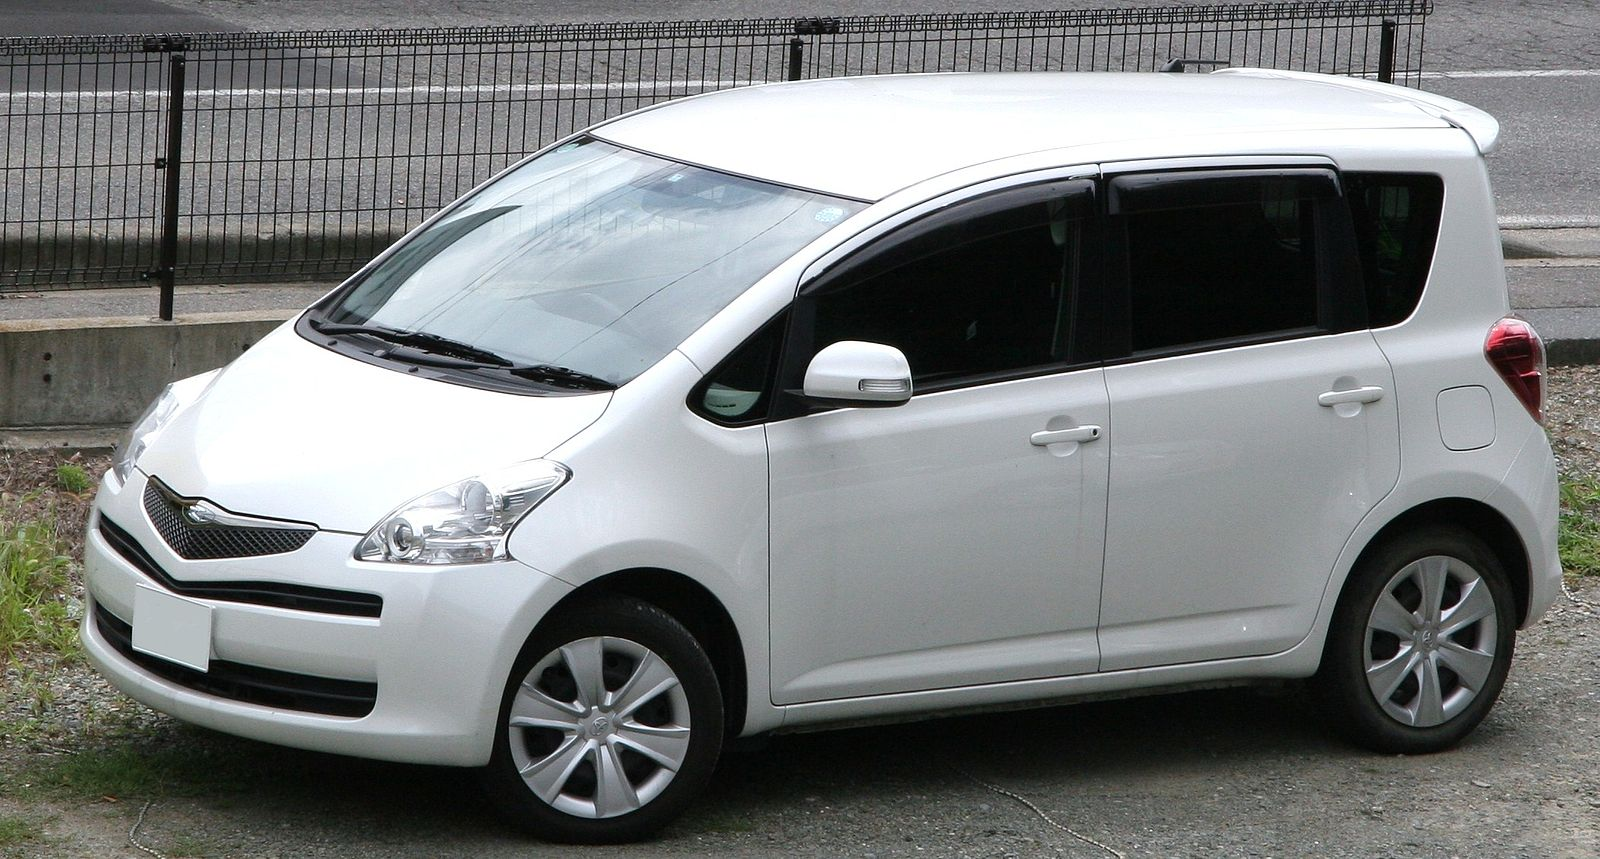 Toyota Ractis - Wikipedia